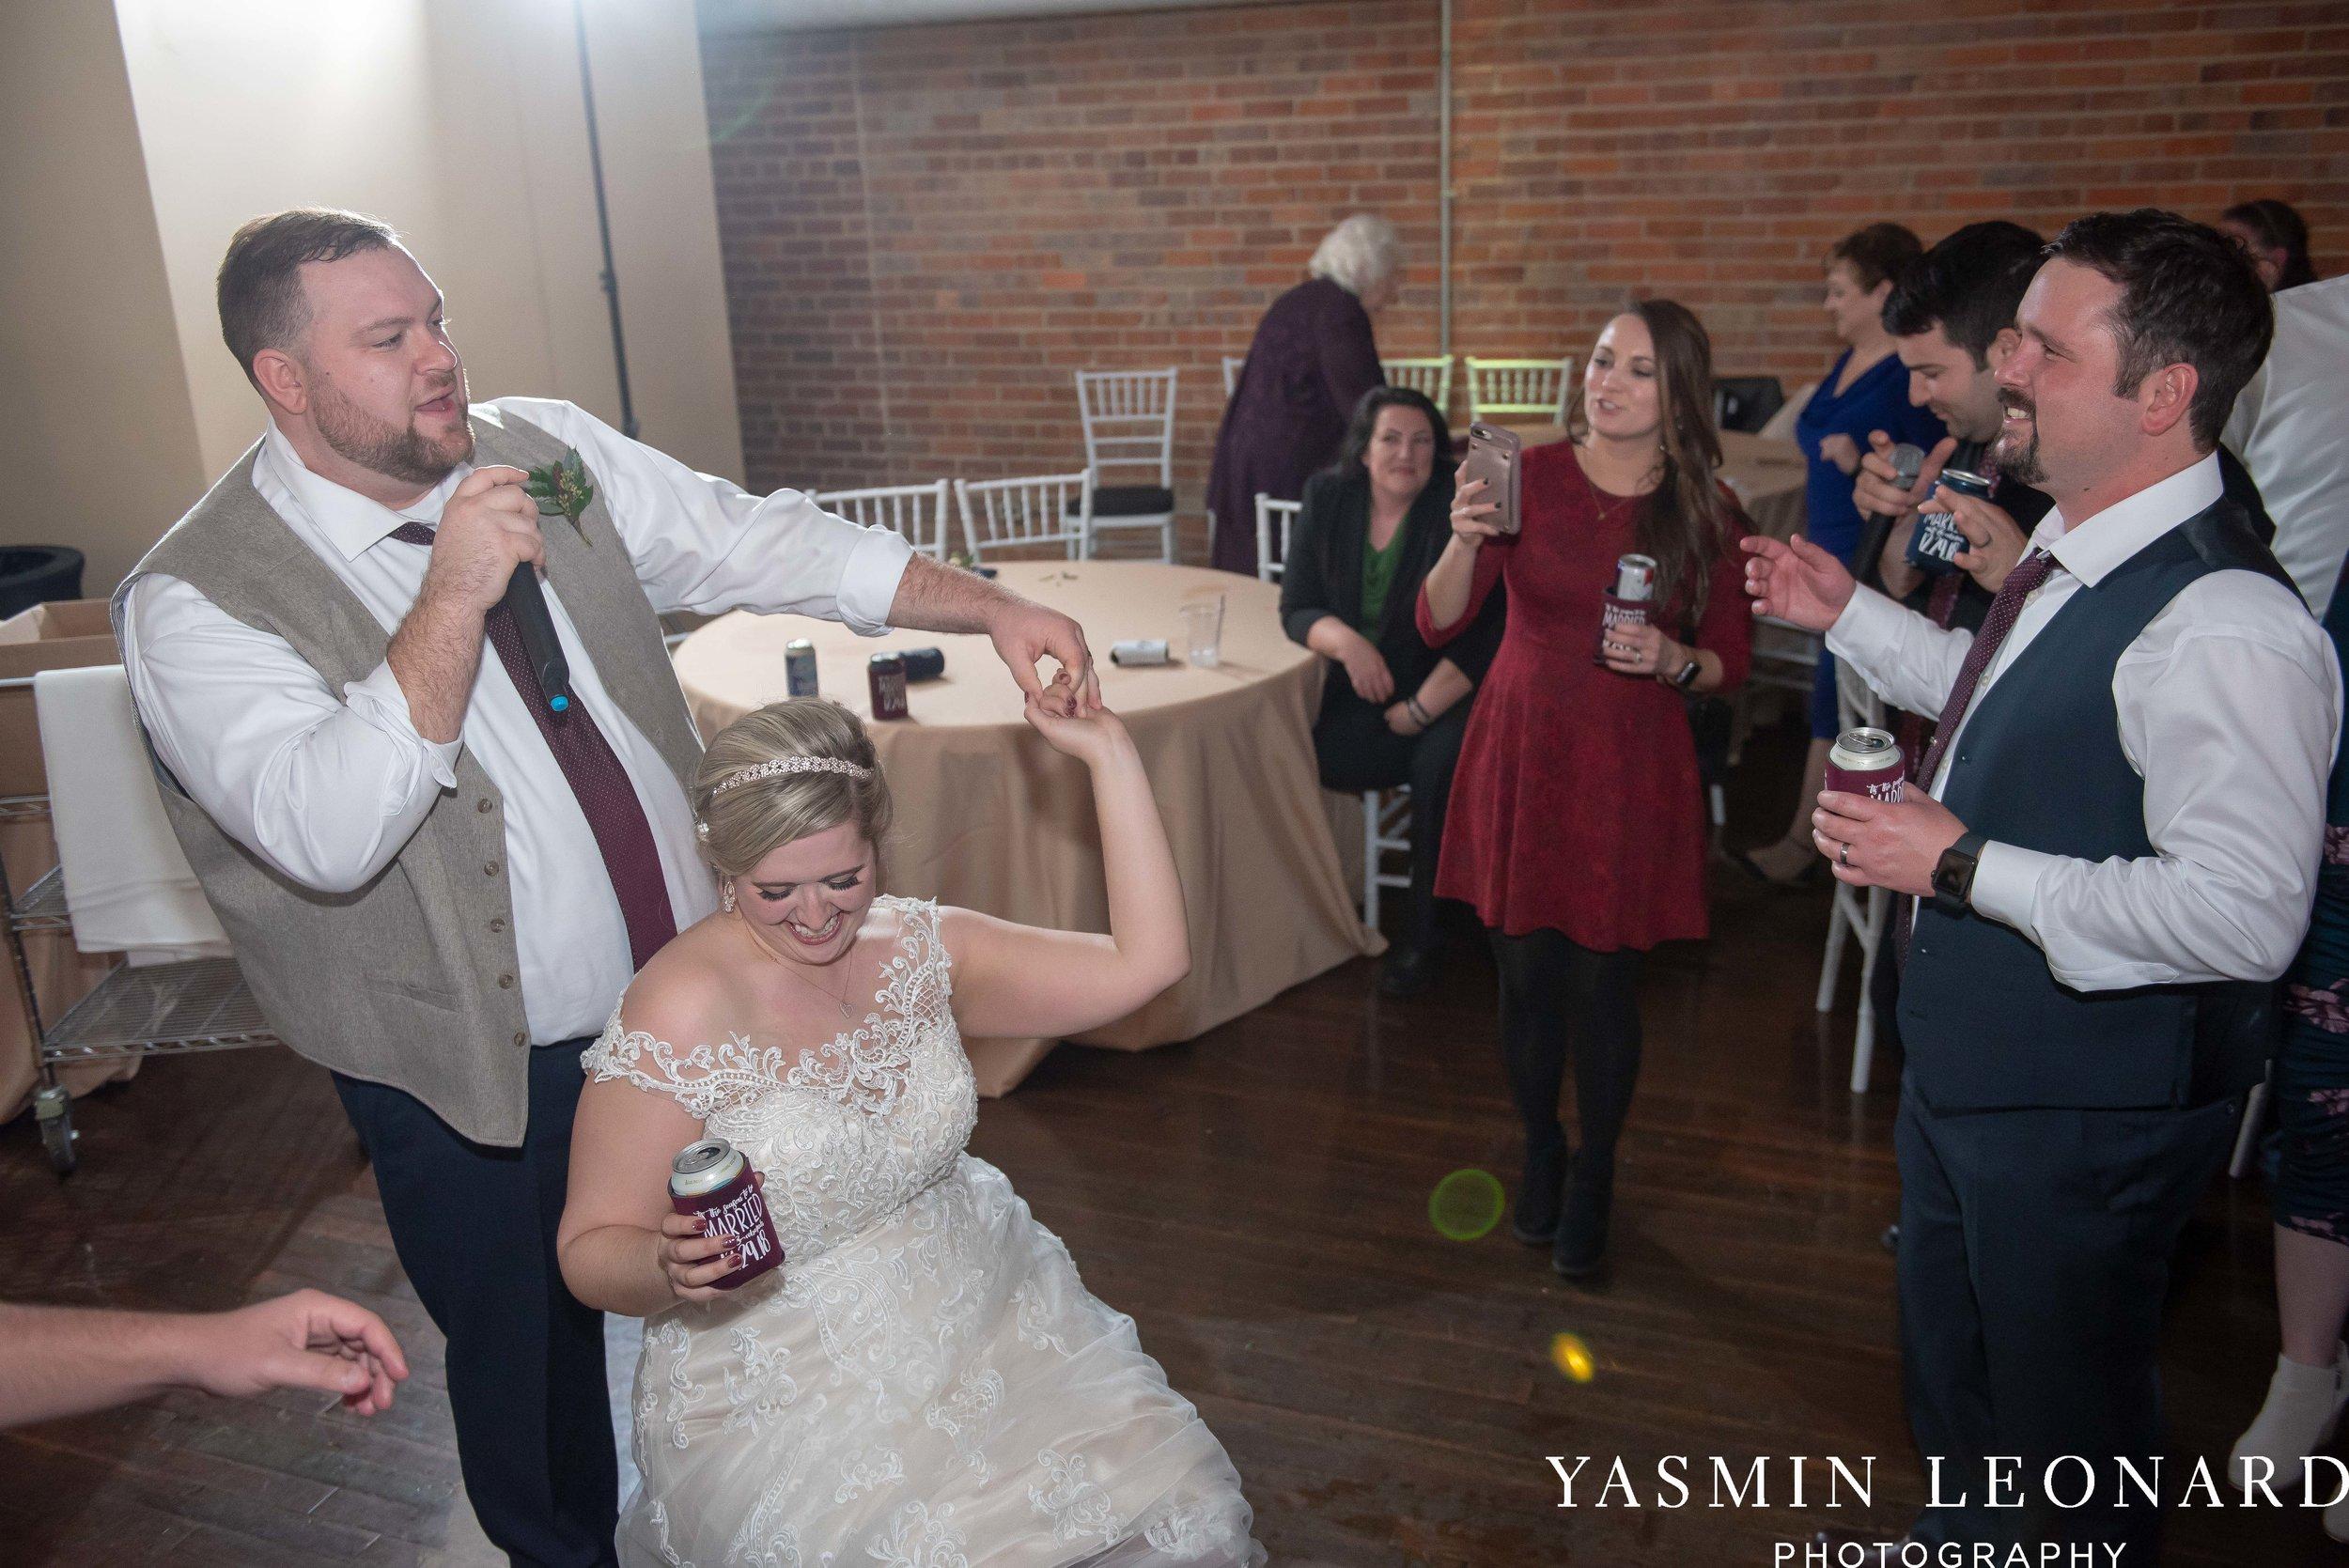 Rebekah and Matt - 105 Worth Event Centre - Yasmin Leonard Photography - Asheboro Wedding - NC Wedding - High Point Weddings - Triad Weddings - Winter Wedding-86.jpg